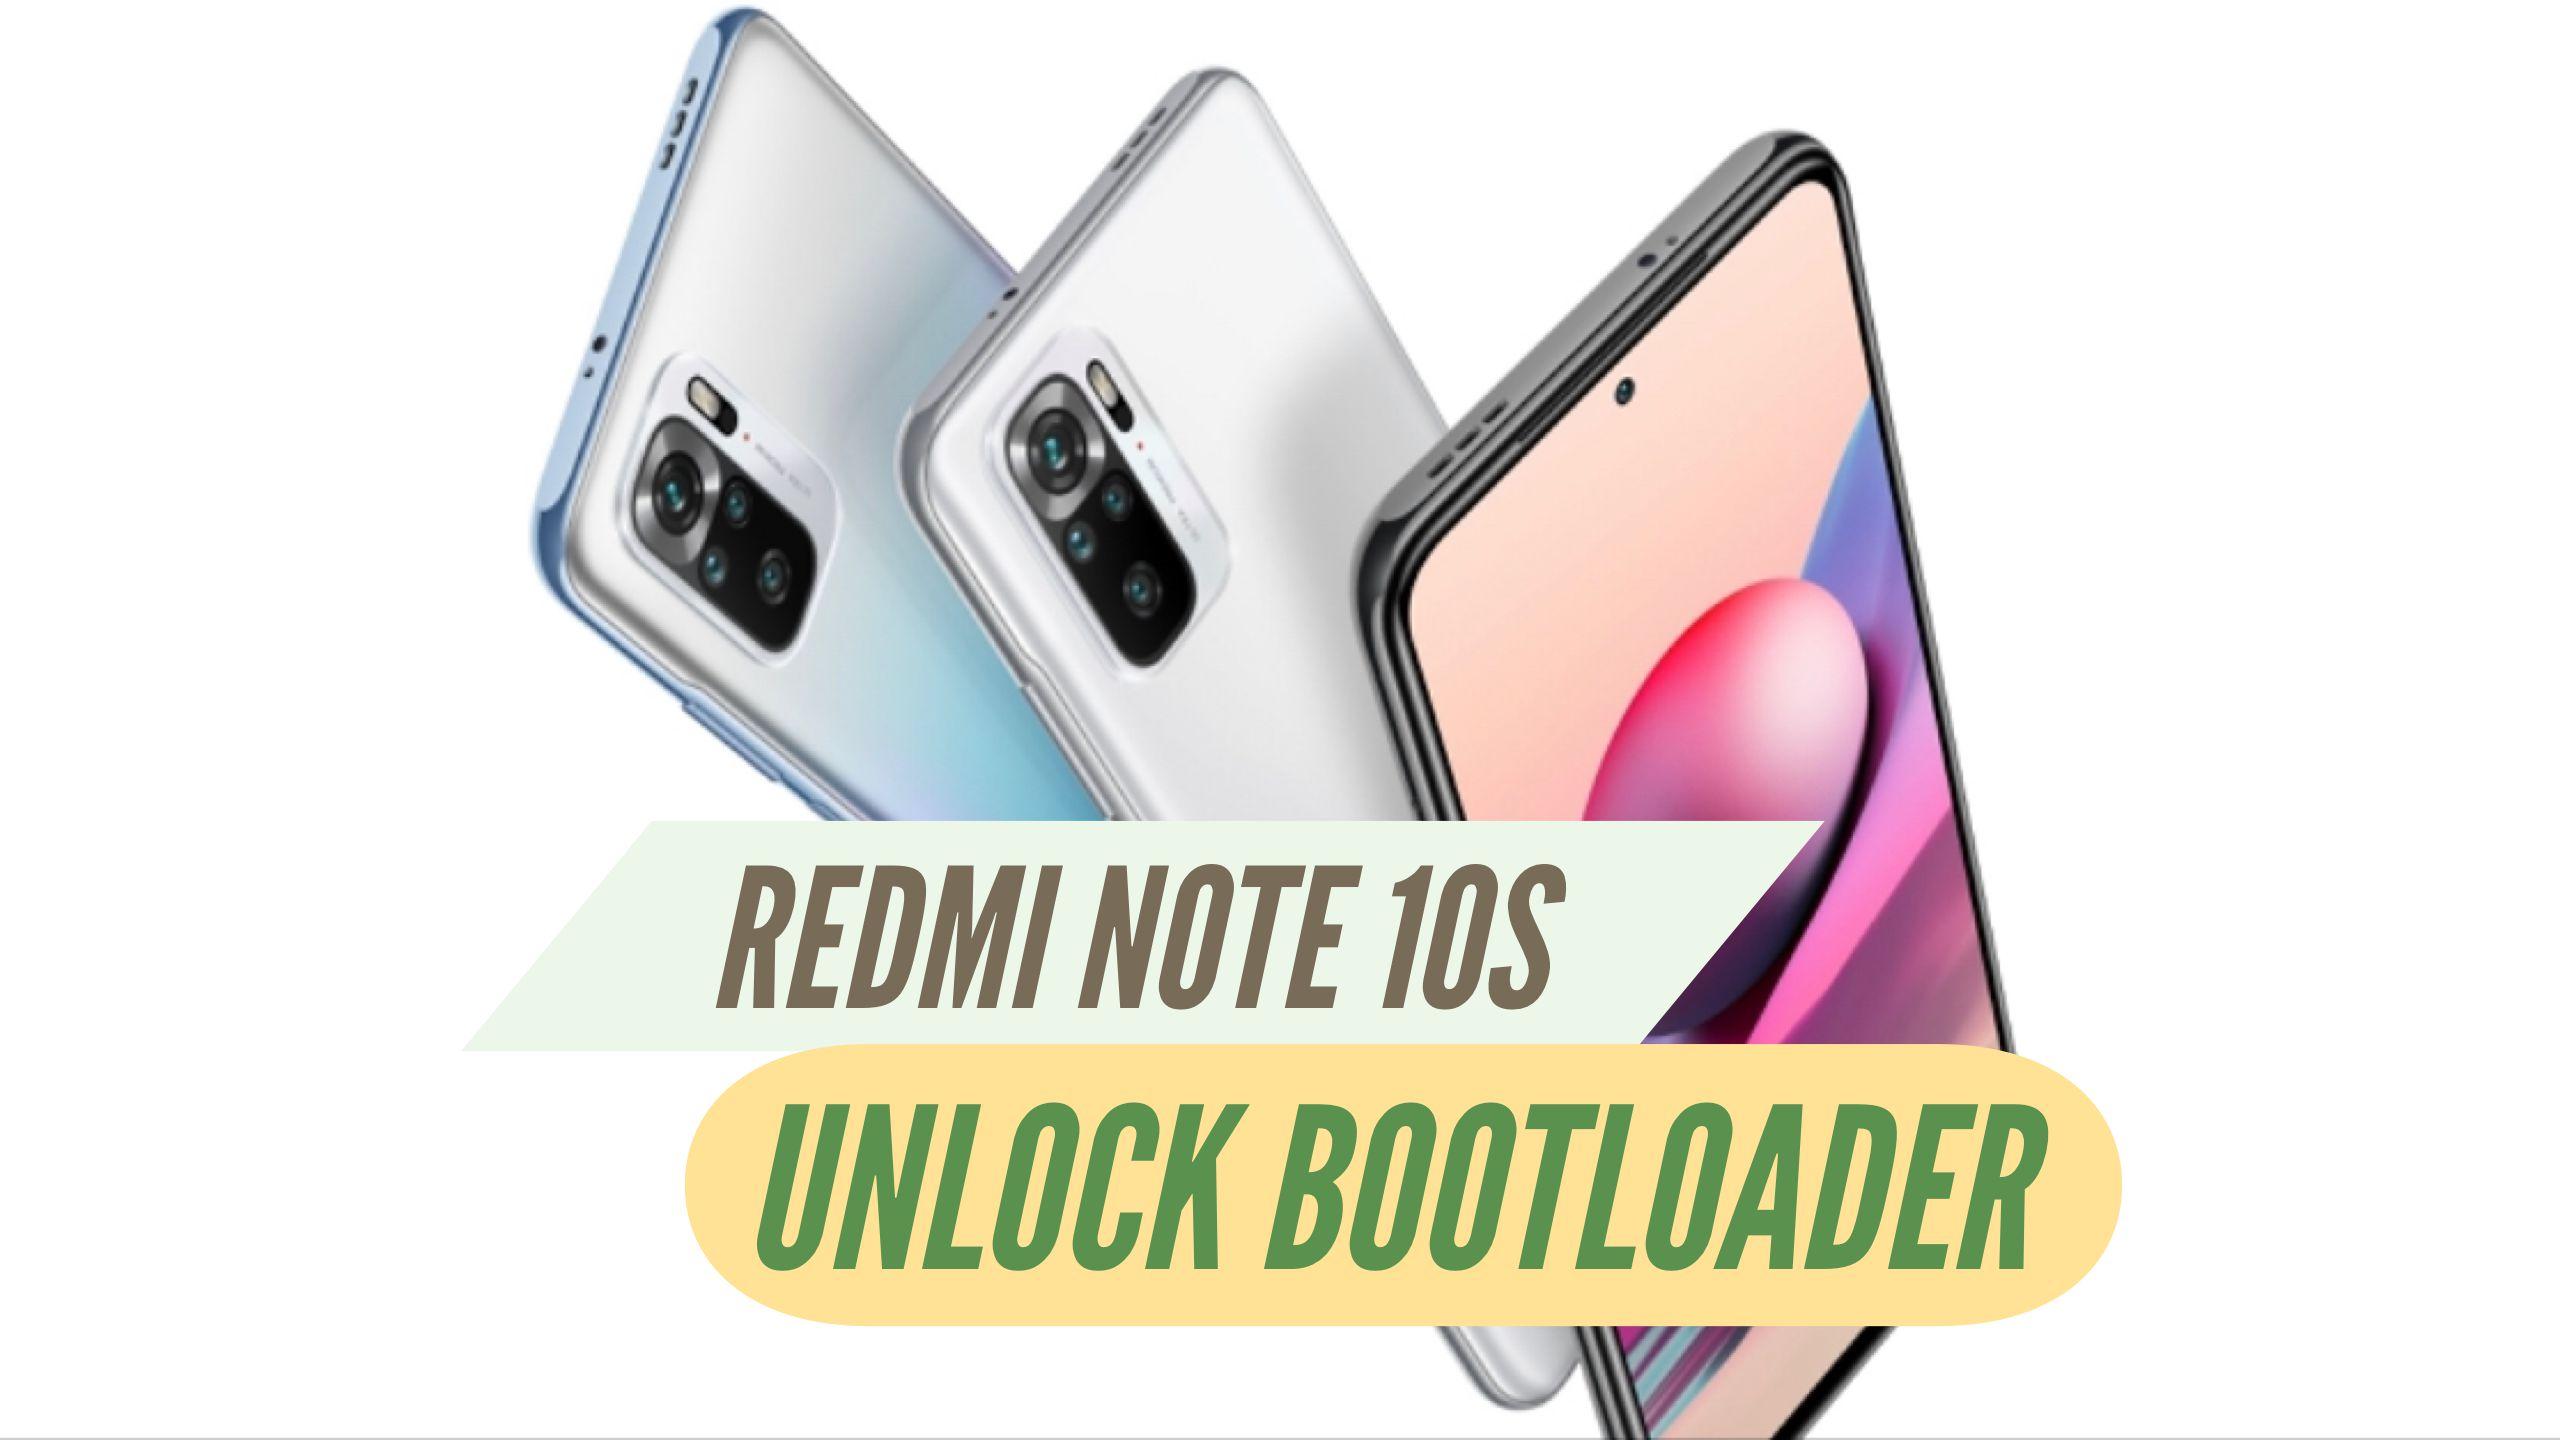 Unlock Bootloader Redmi Note 10S